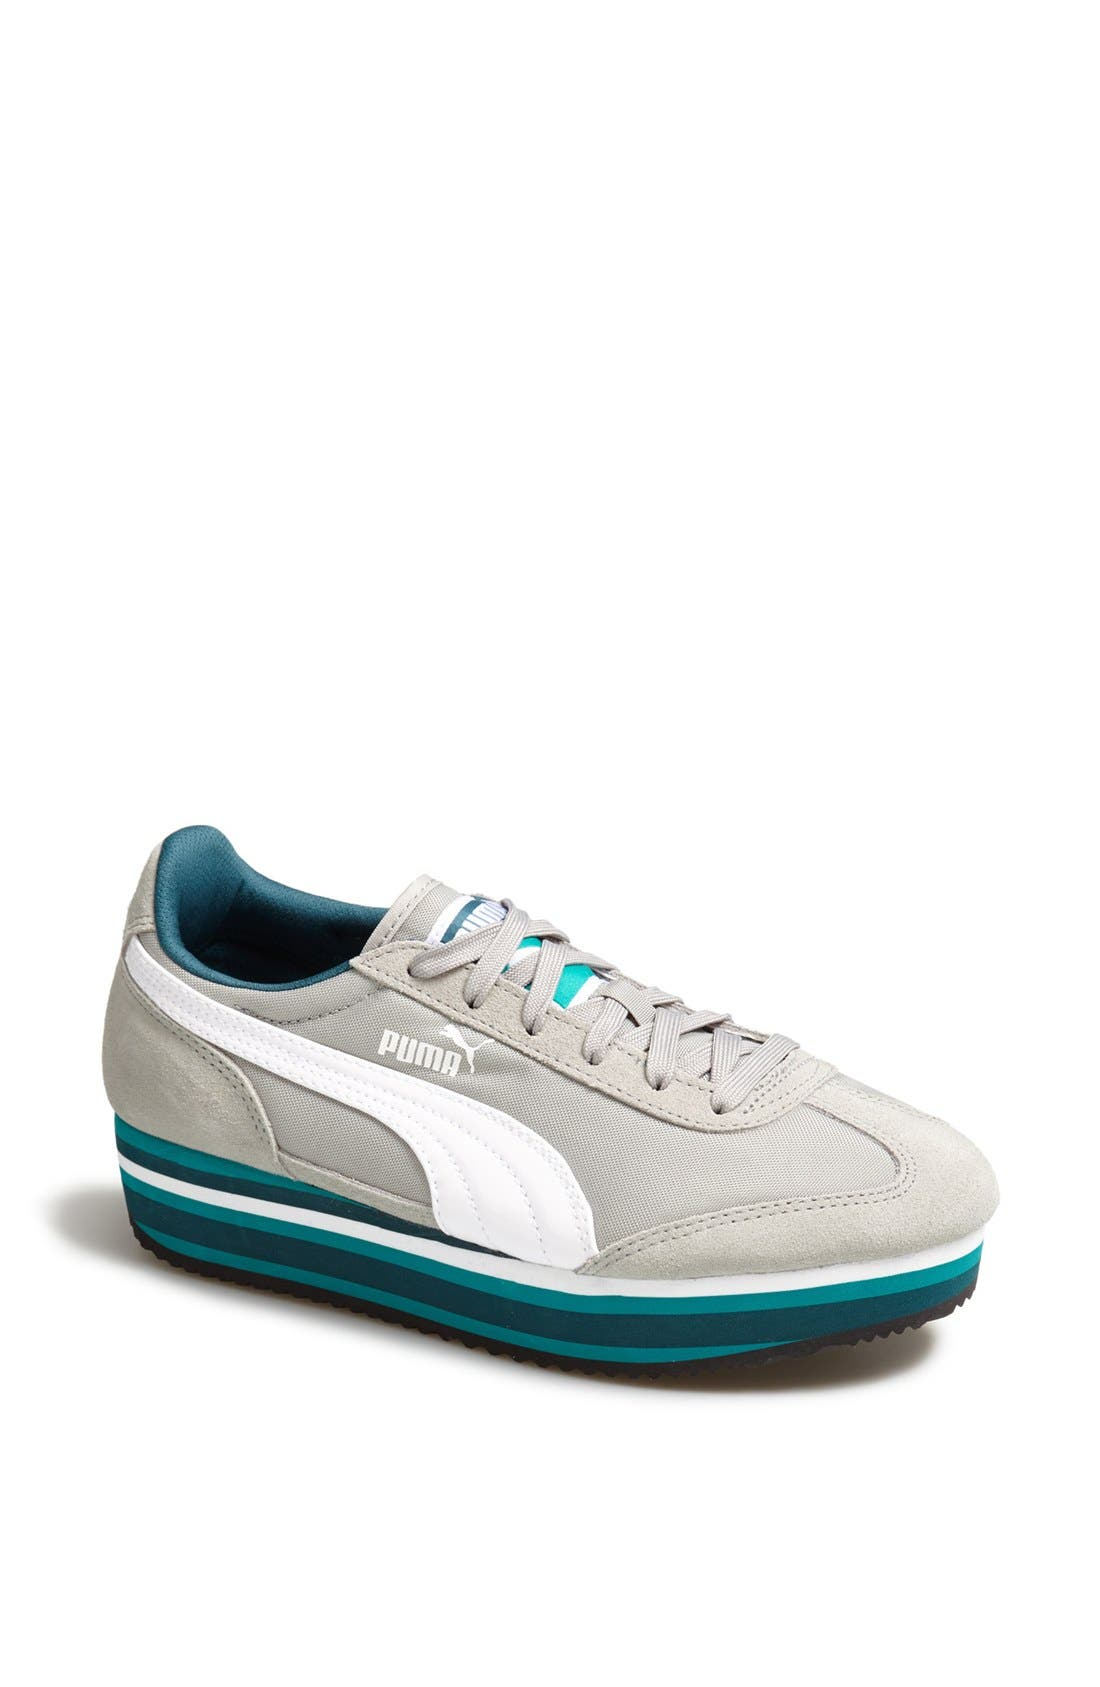 Main Image - PUMA 'SF 77' Platform Sneaker